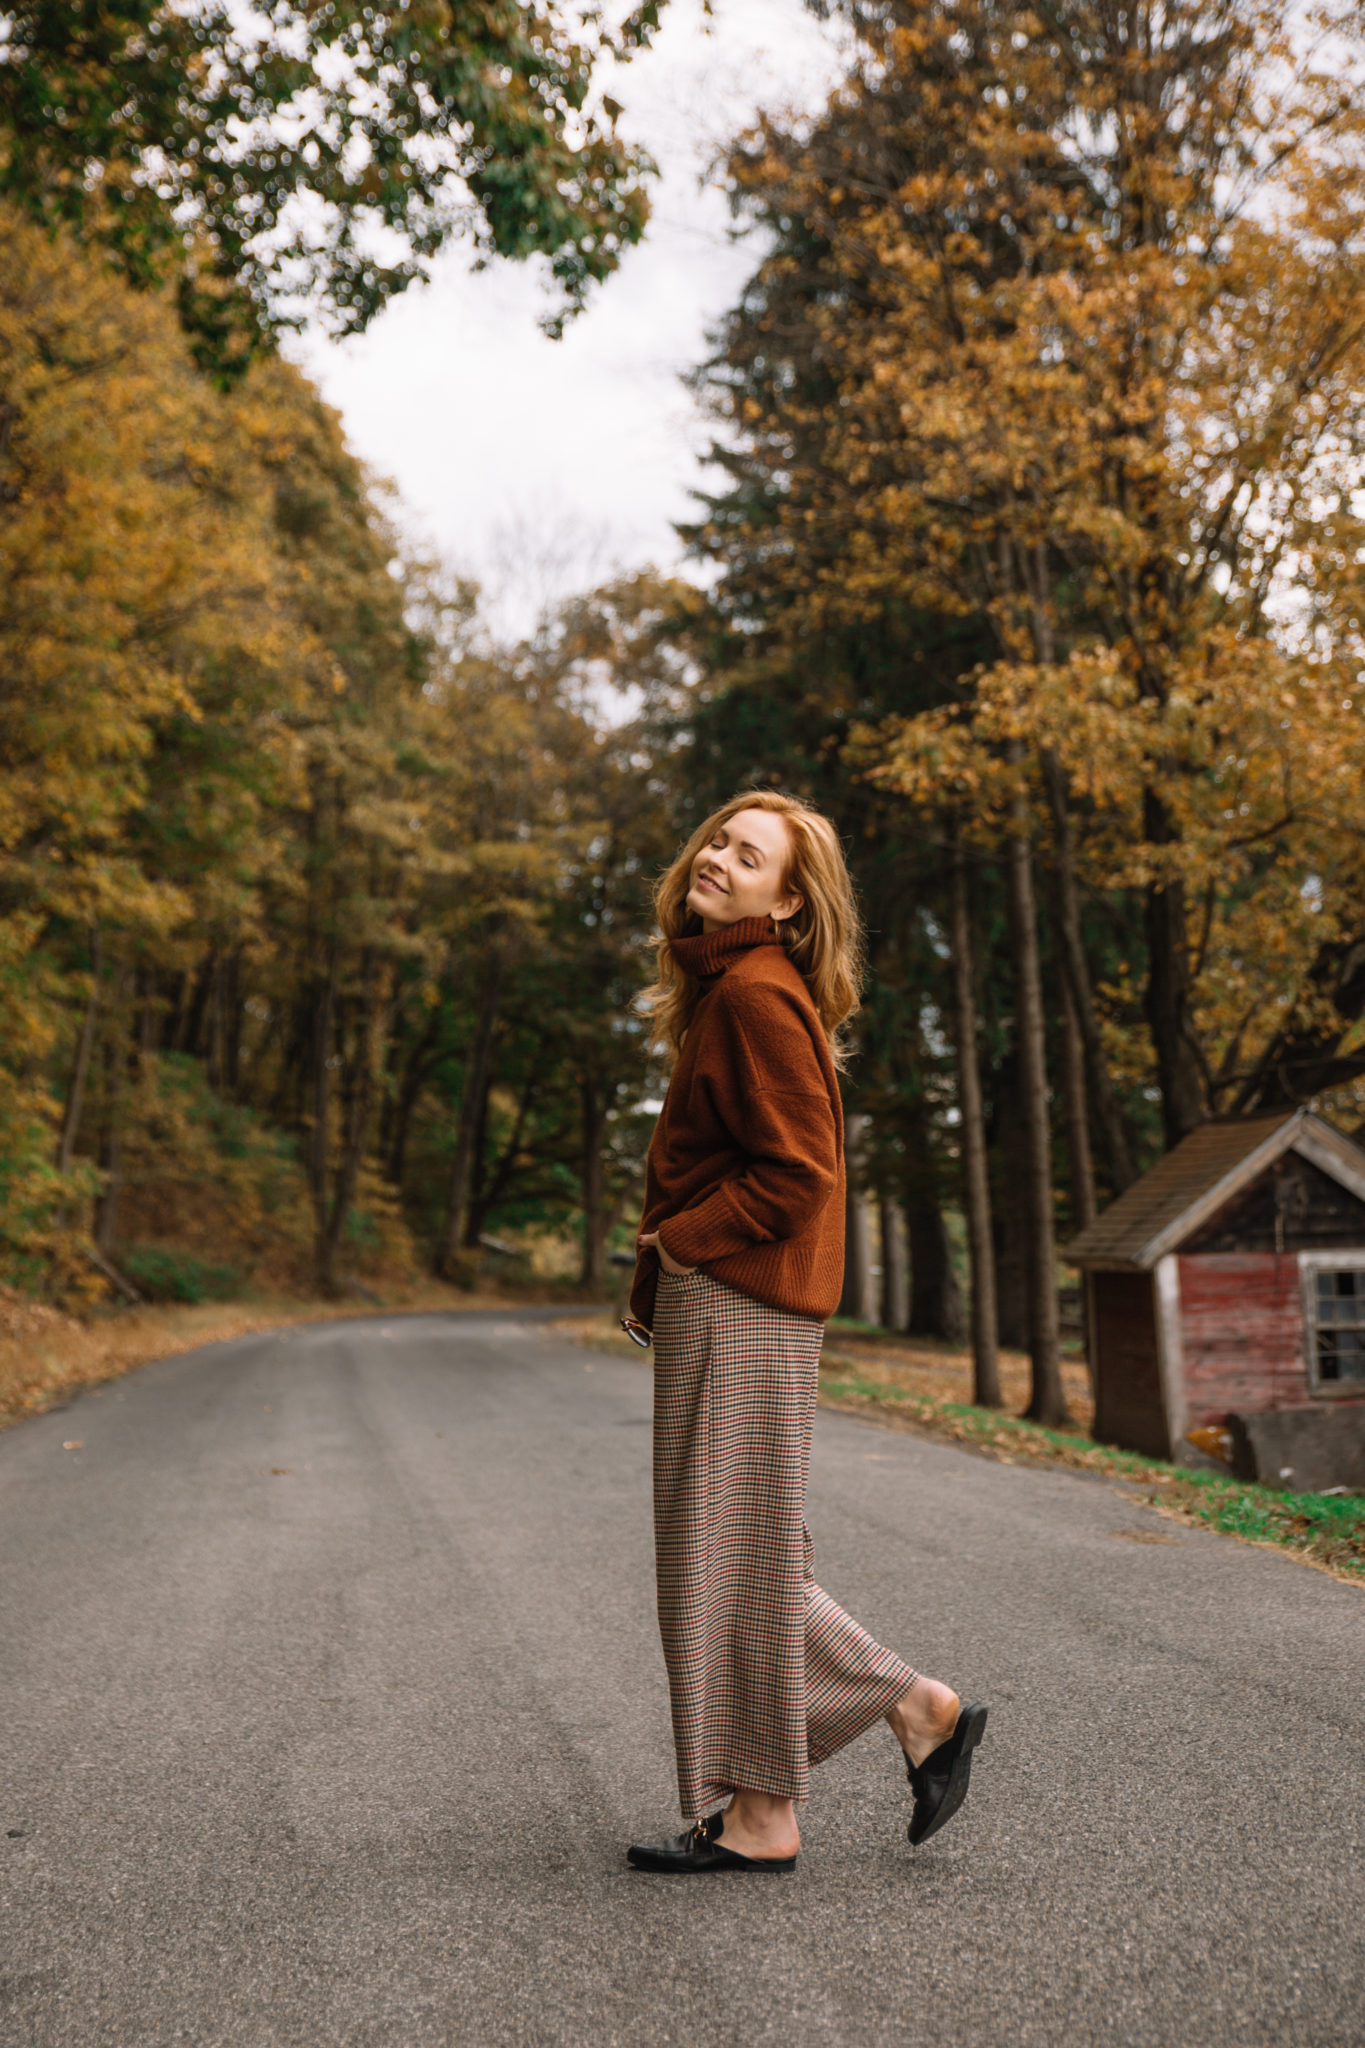 Brooke Saward in Upstate New York